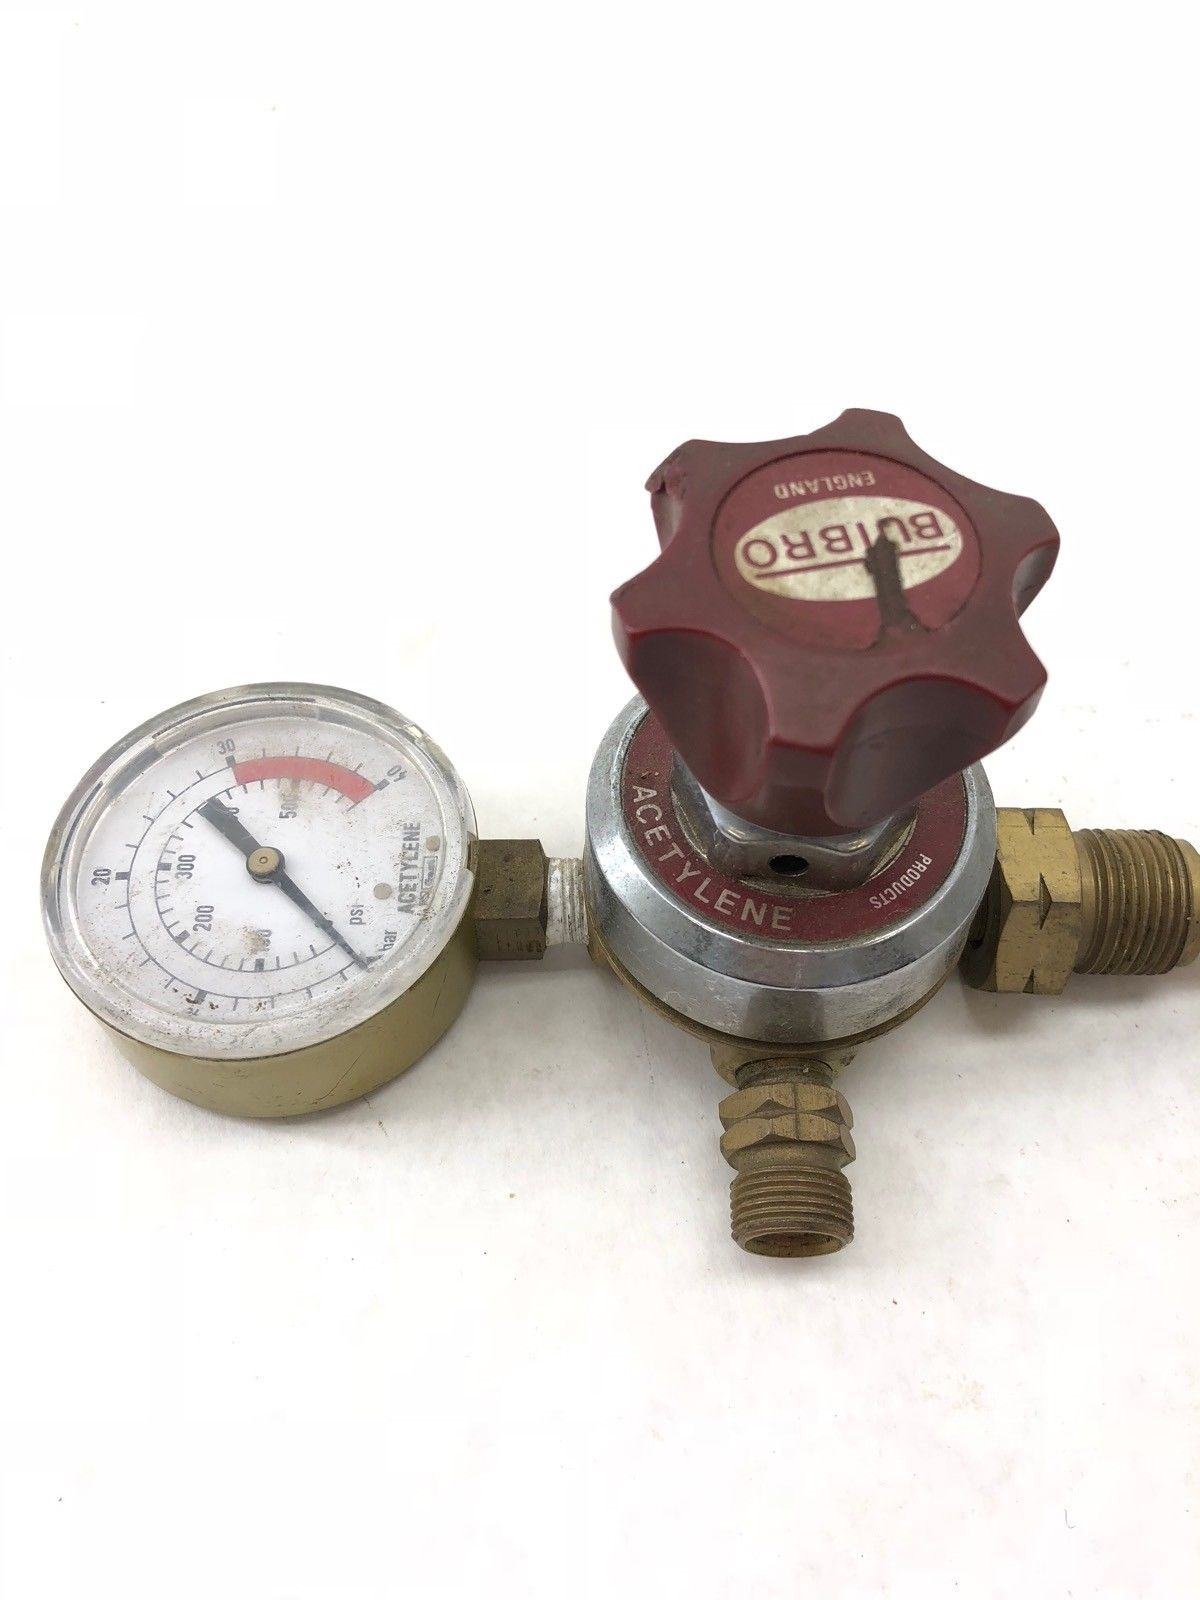 USED BUTBRO VALVE ACETYLENE GAUGE 0-40 BAR 0-580 PSI, FAST SHIP! (H2) 2